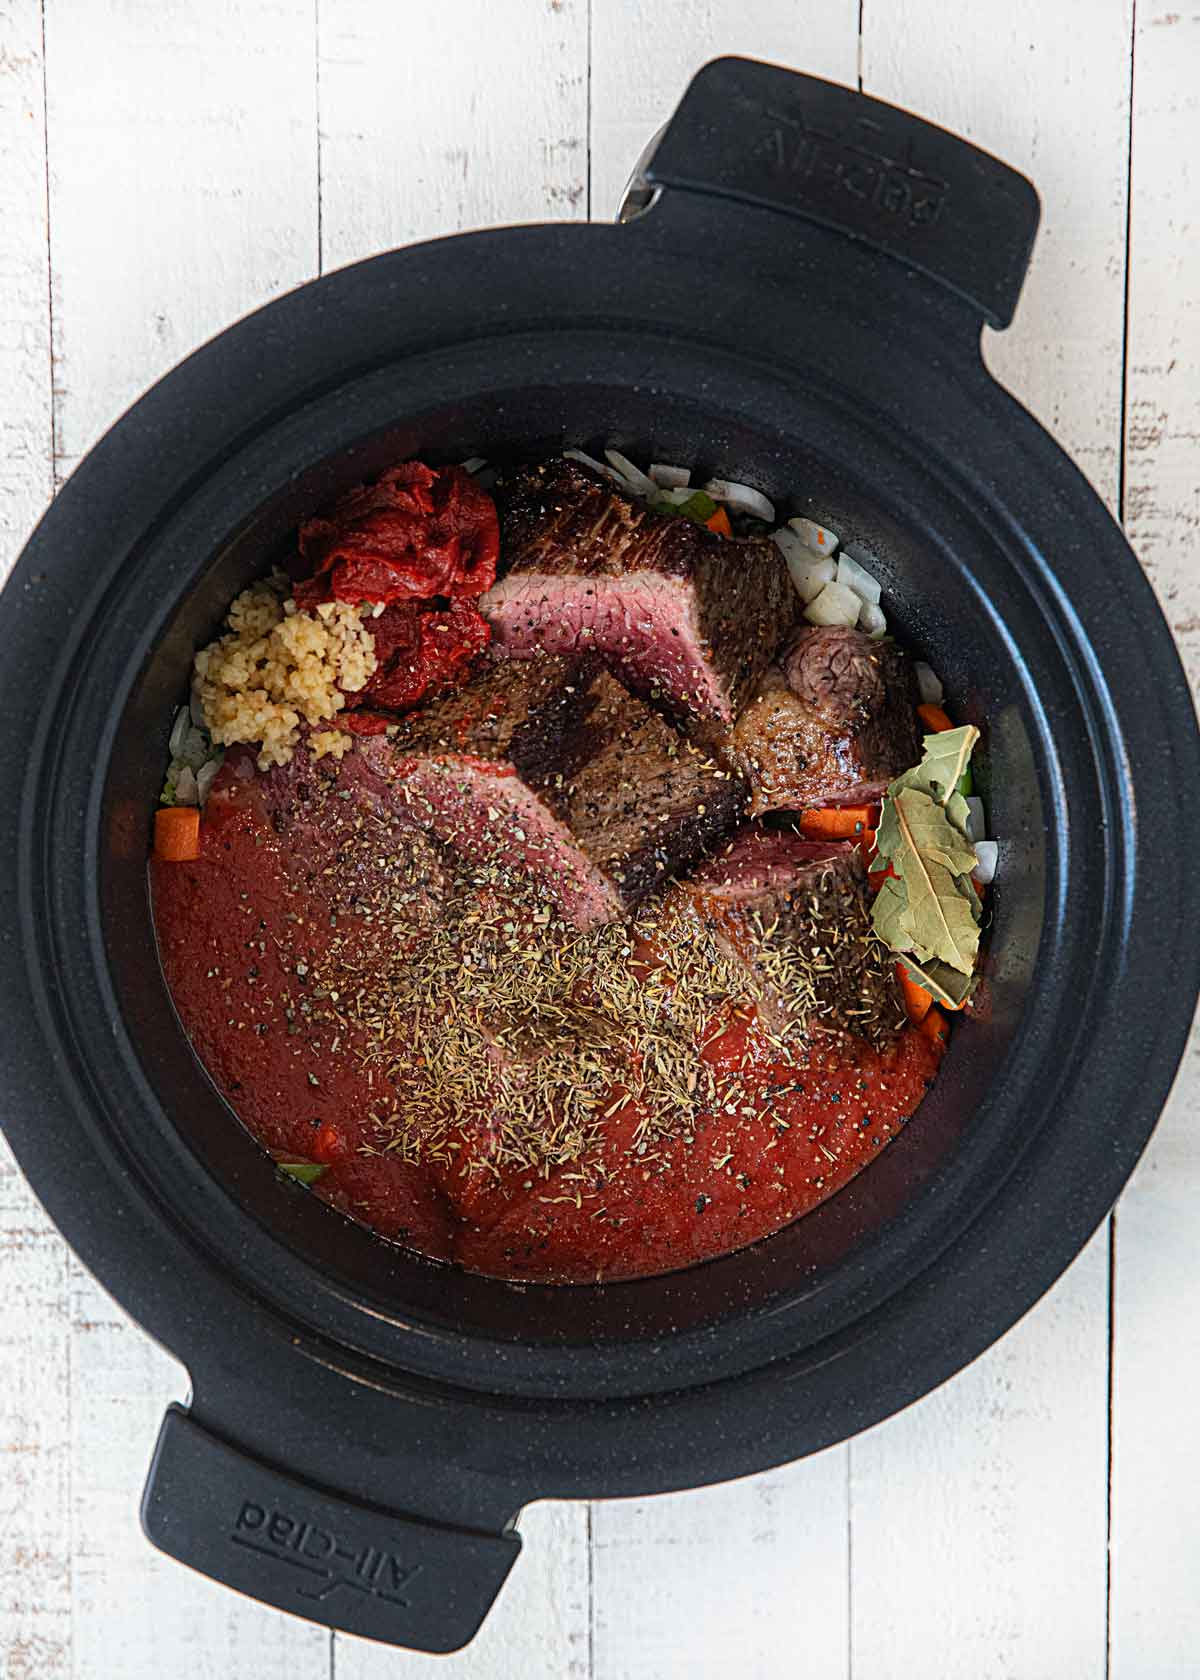 Lite Beef Ragu in slow cooker before cooking